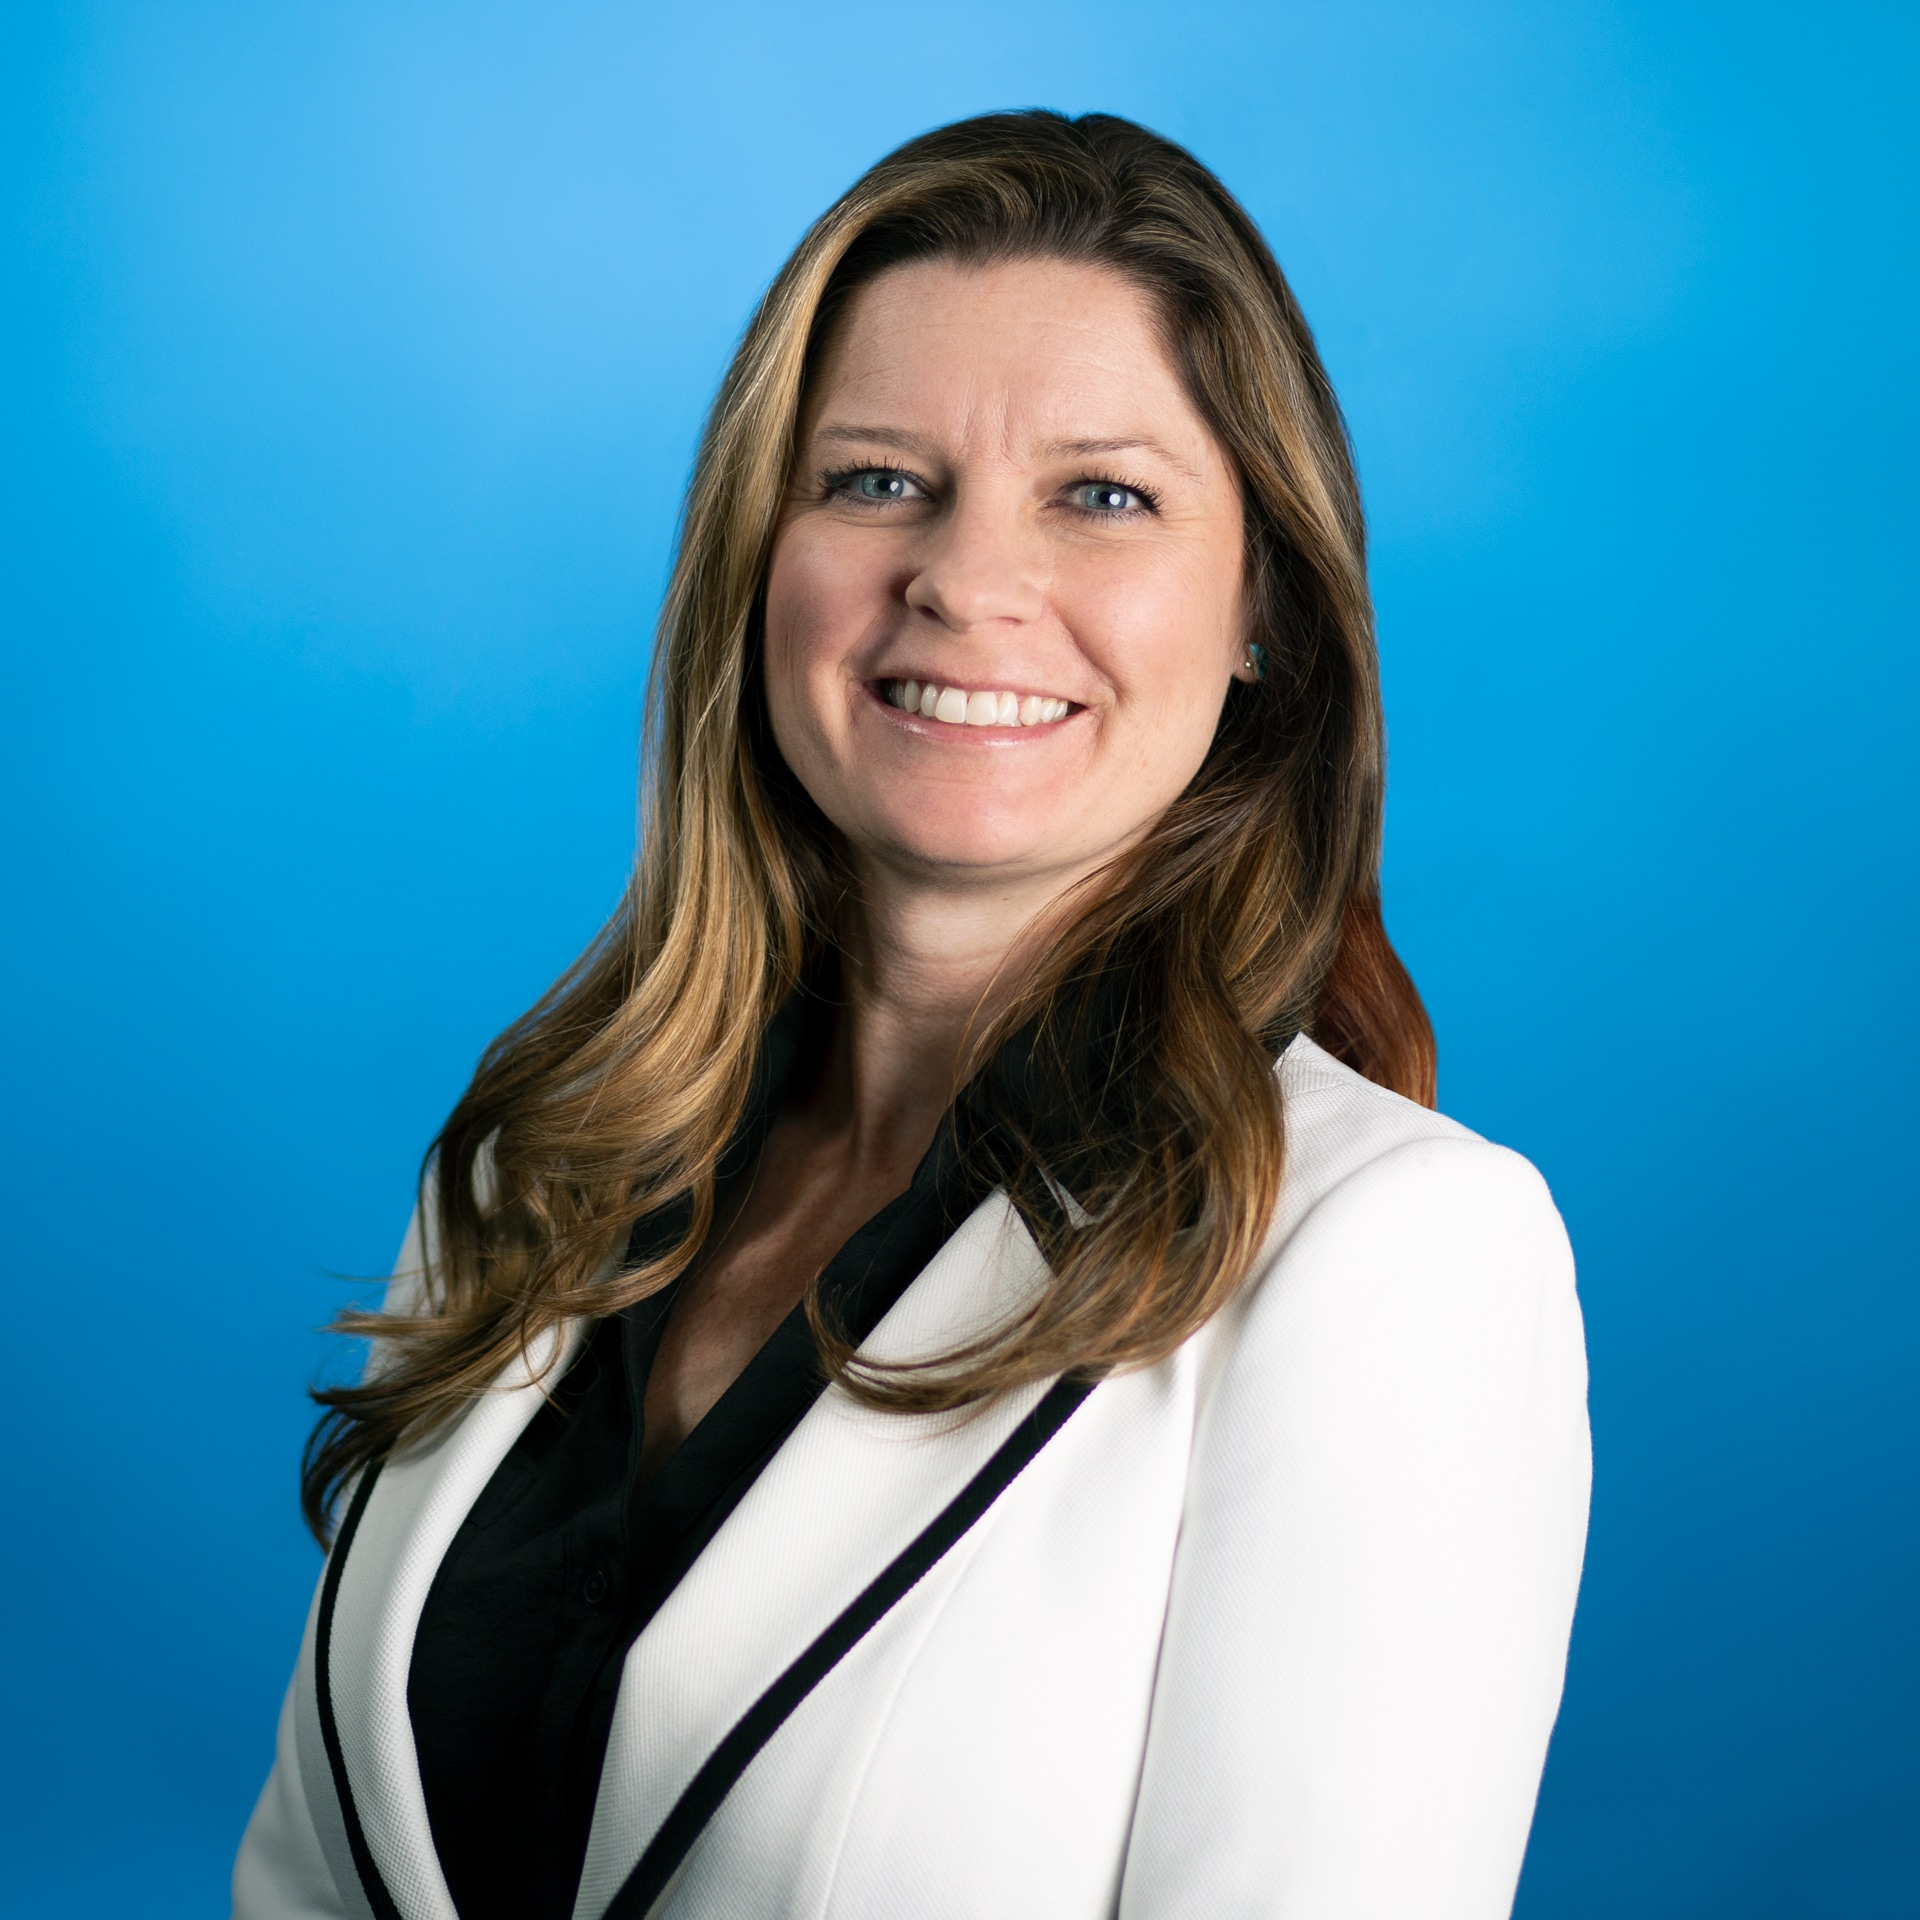 Melissa Murphy - IMAGO's Director of Partner Services